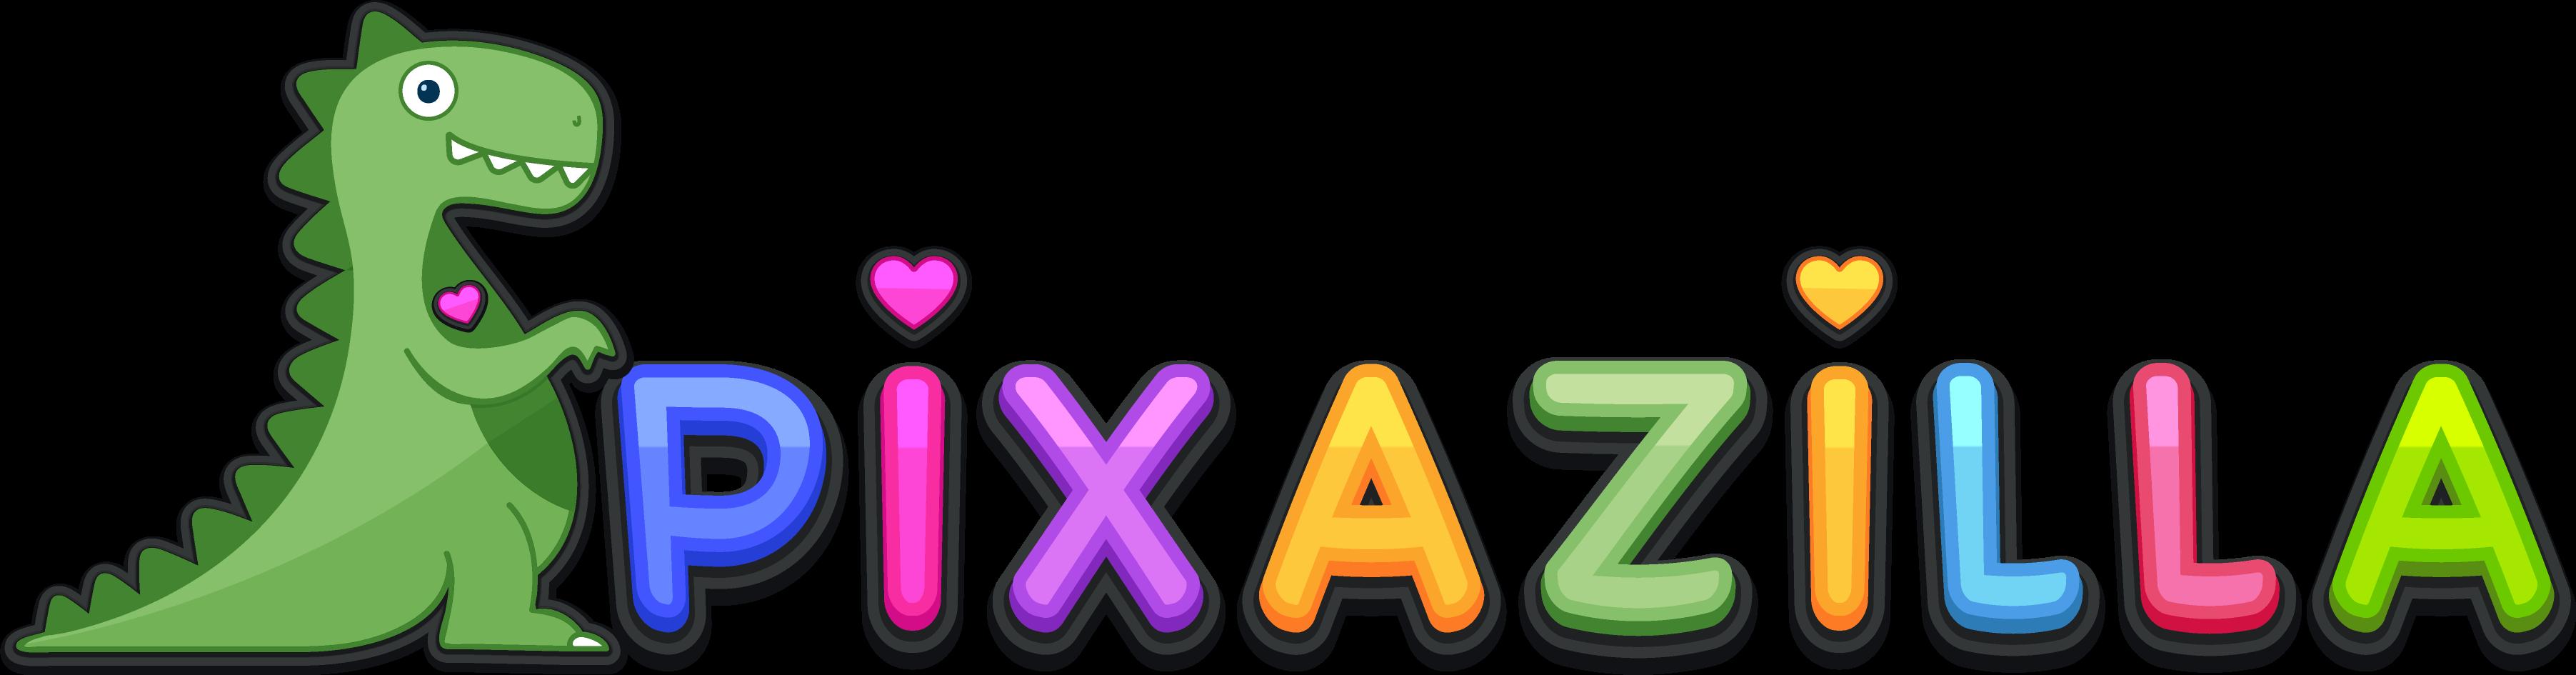 Pixazilla.hu logó